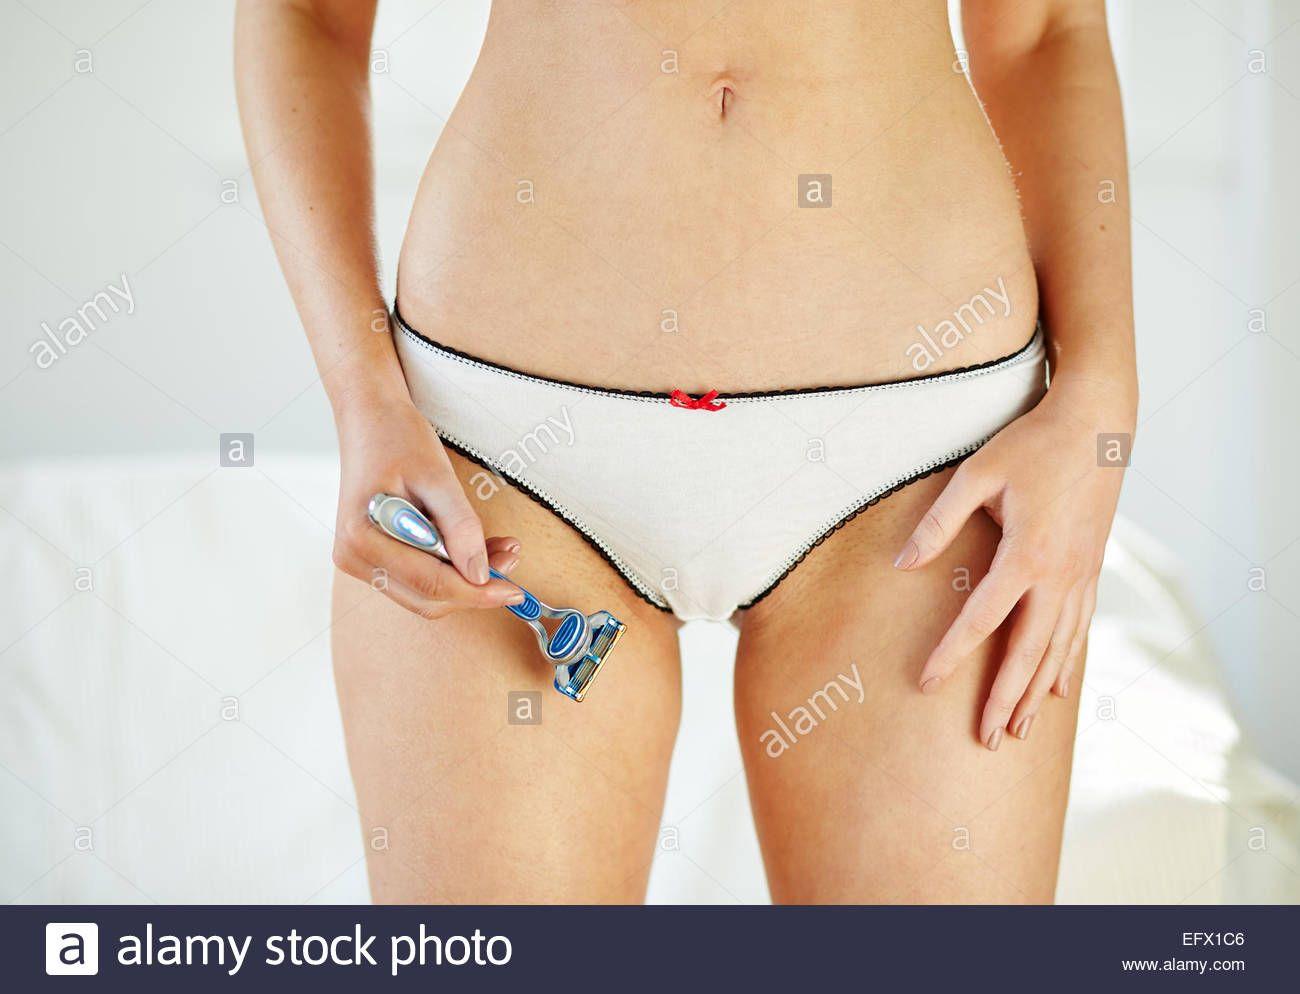 Bikini line photographs